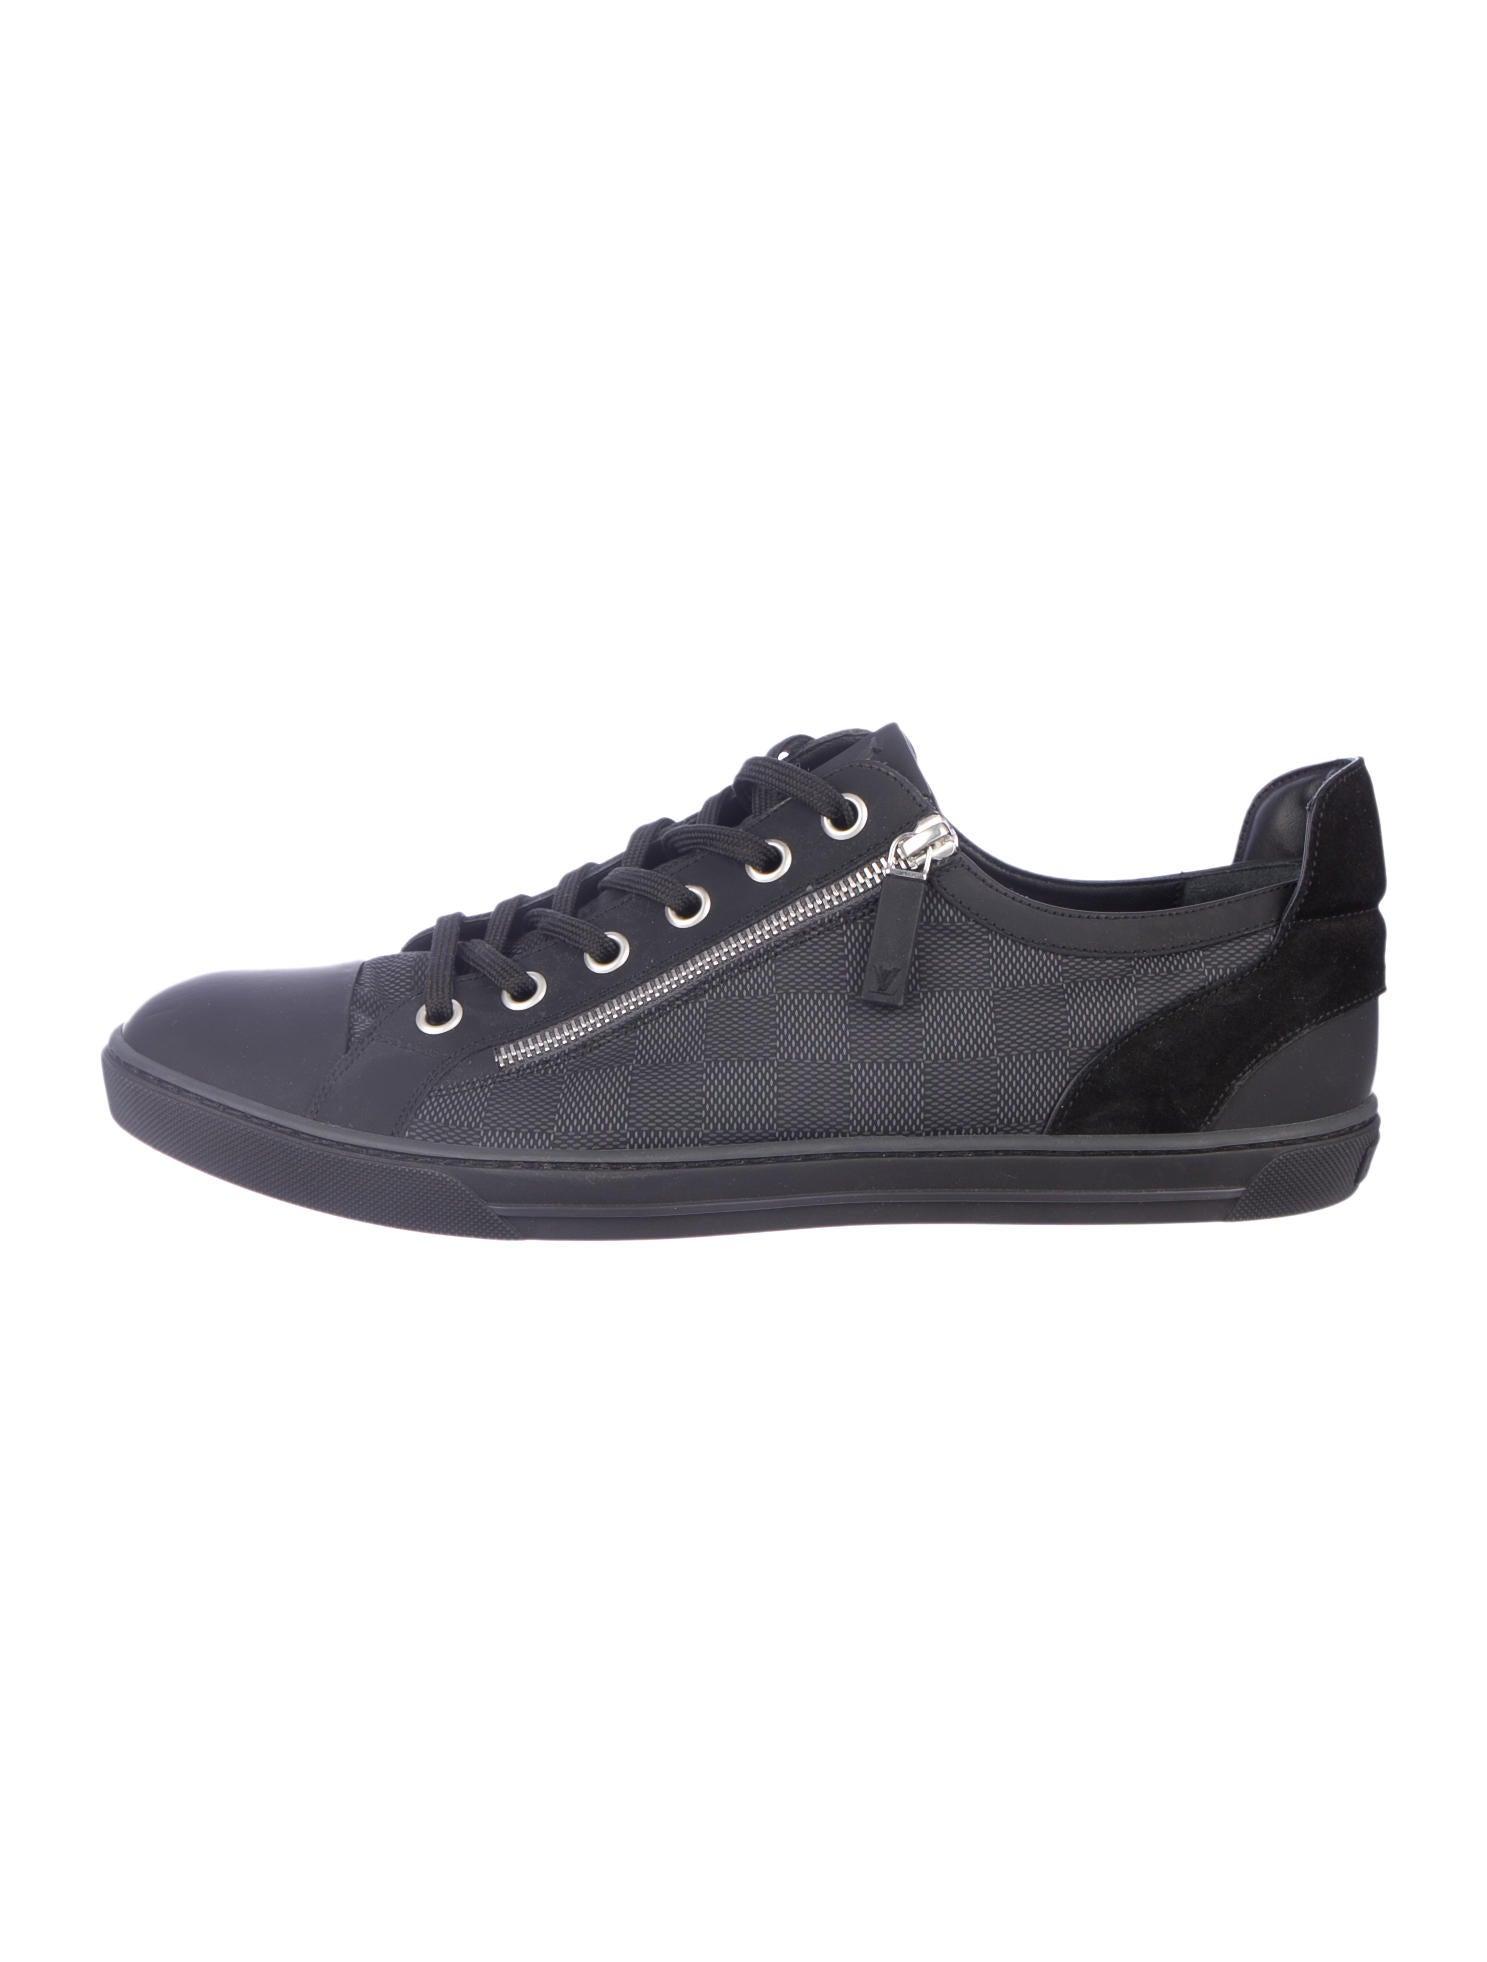 b1d2919d6bf mens louis vuitton sneakers, christian louboutin men spikes